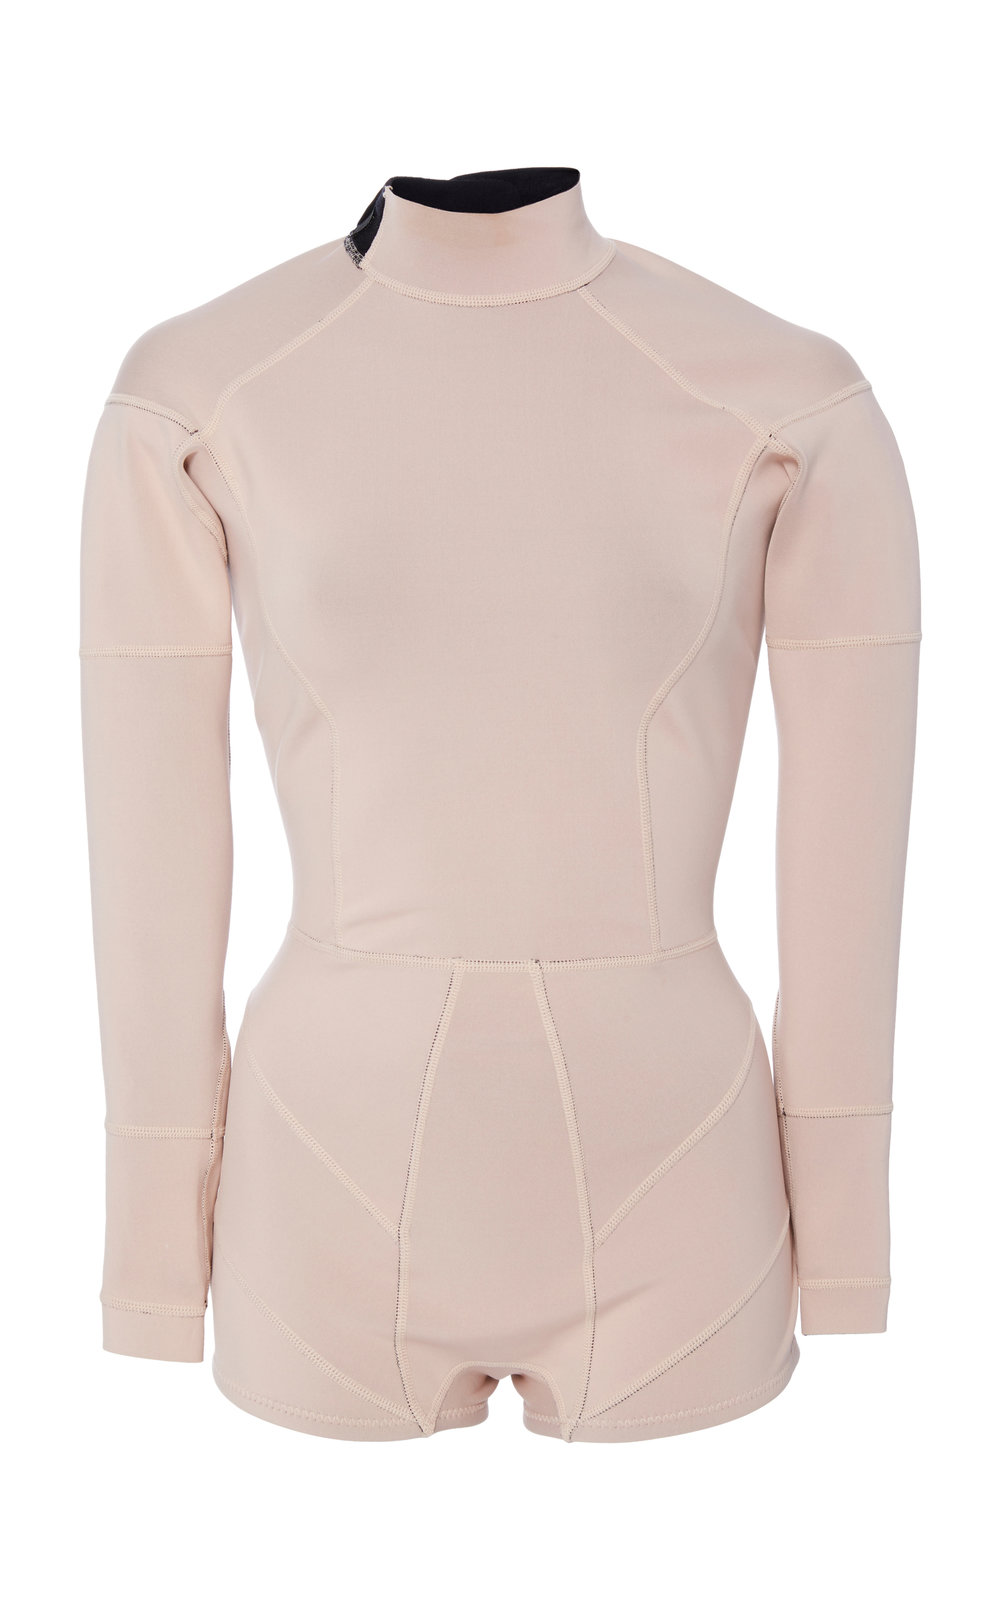 Cynthia Rowley Rosebud Long Sleeve Wetsuit